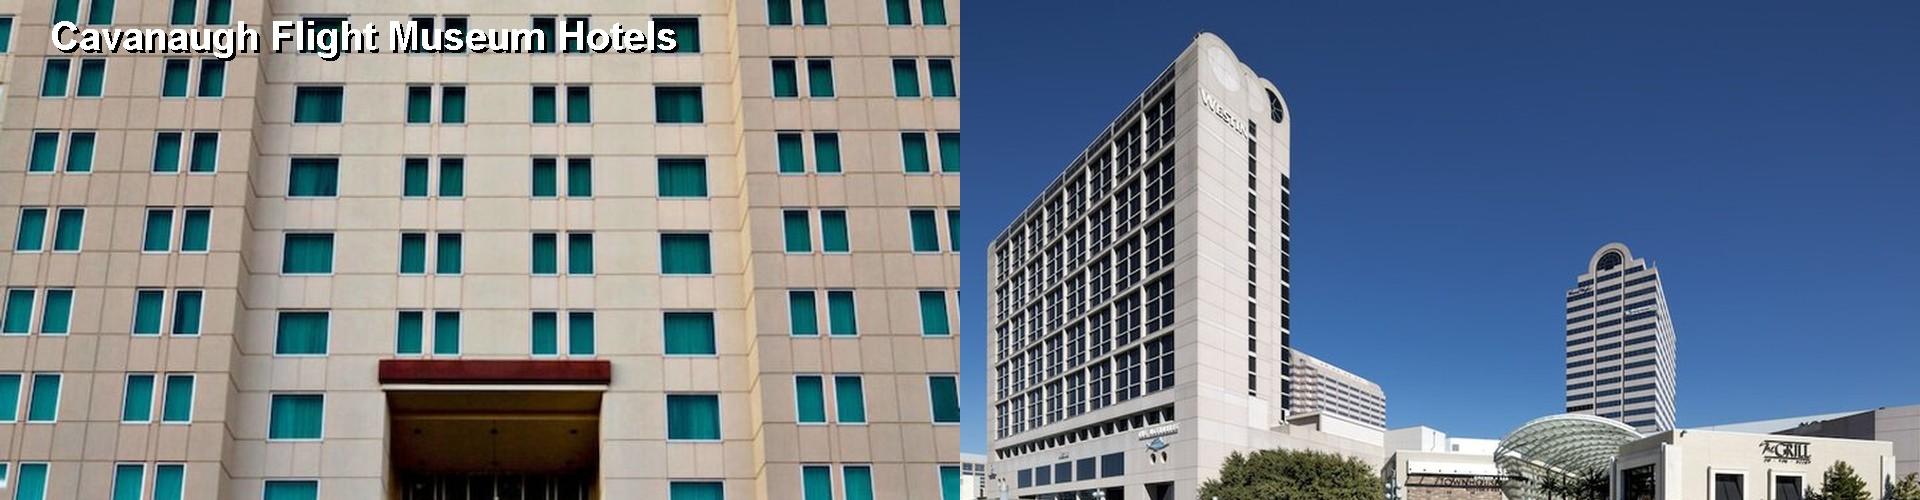 5 Best Hotels Near Cavanaugh Flight Museum